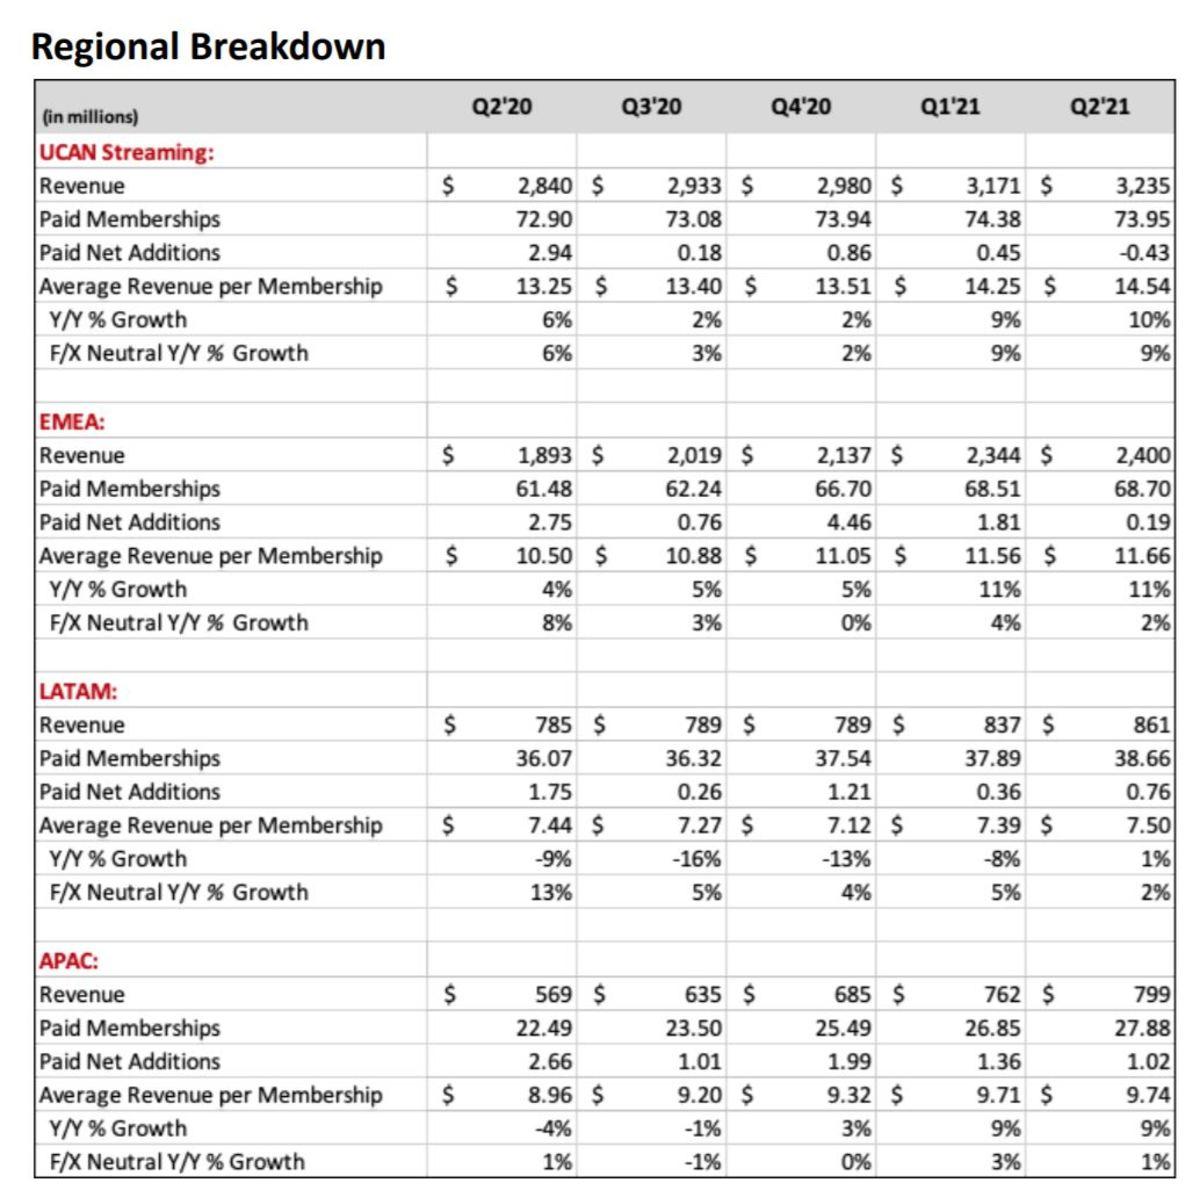 NFLX Q2 regions